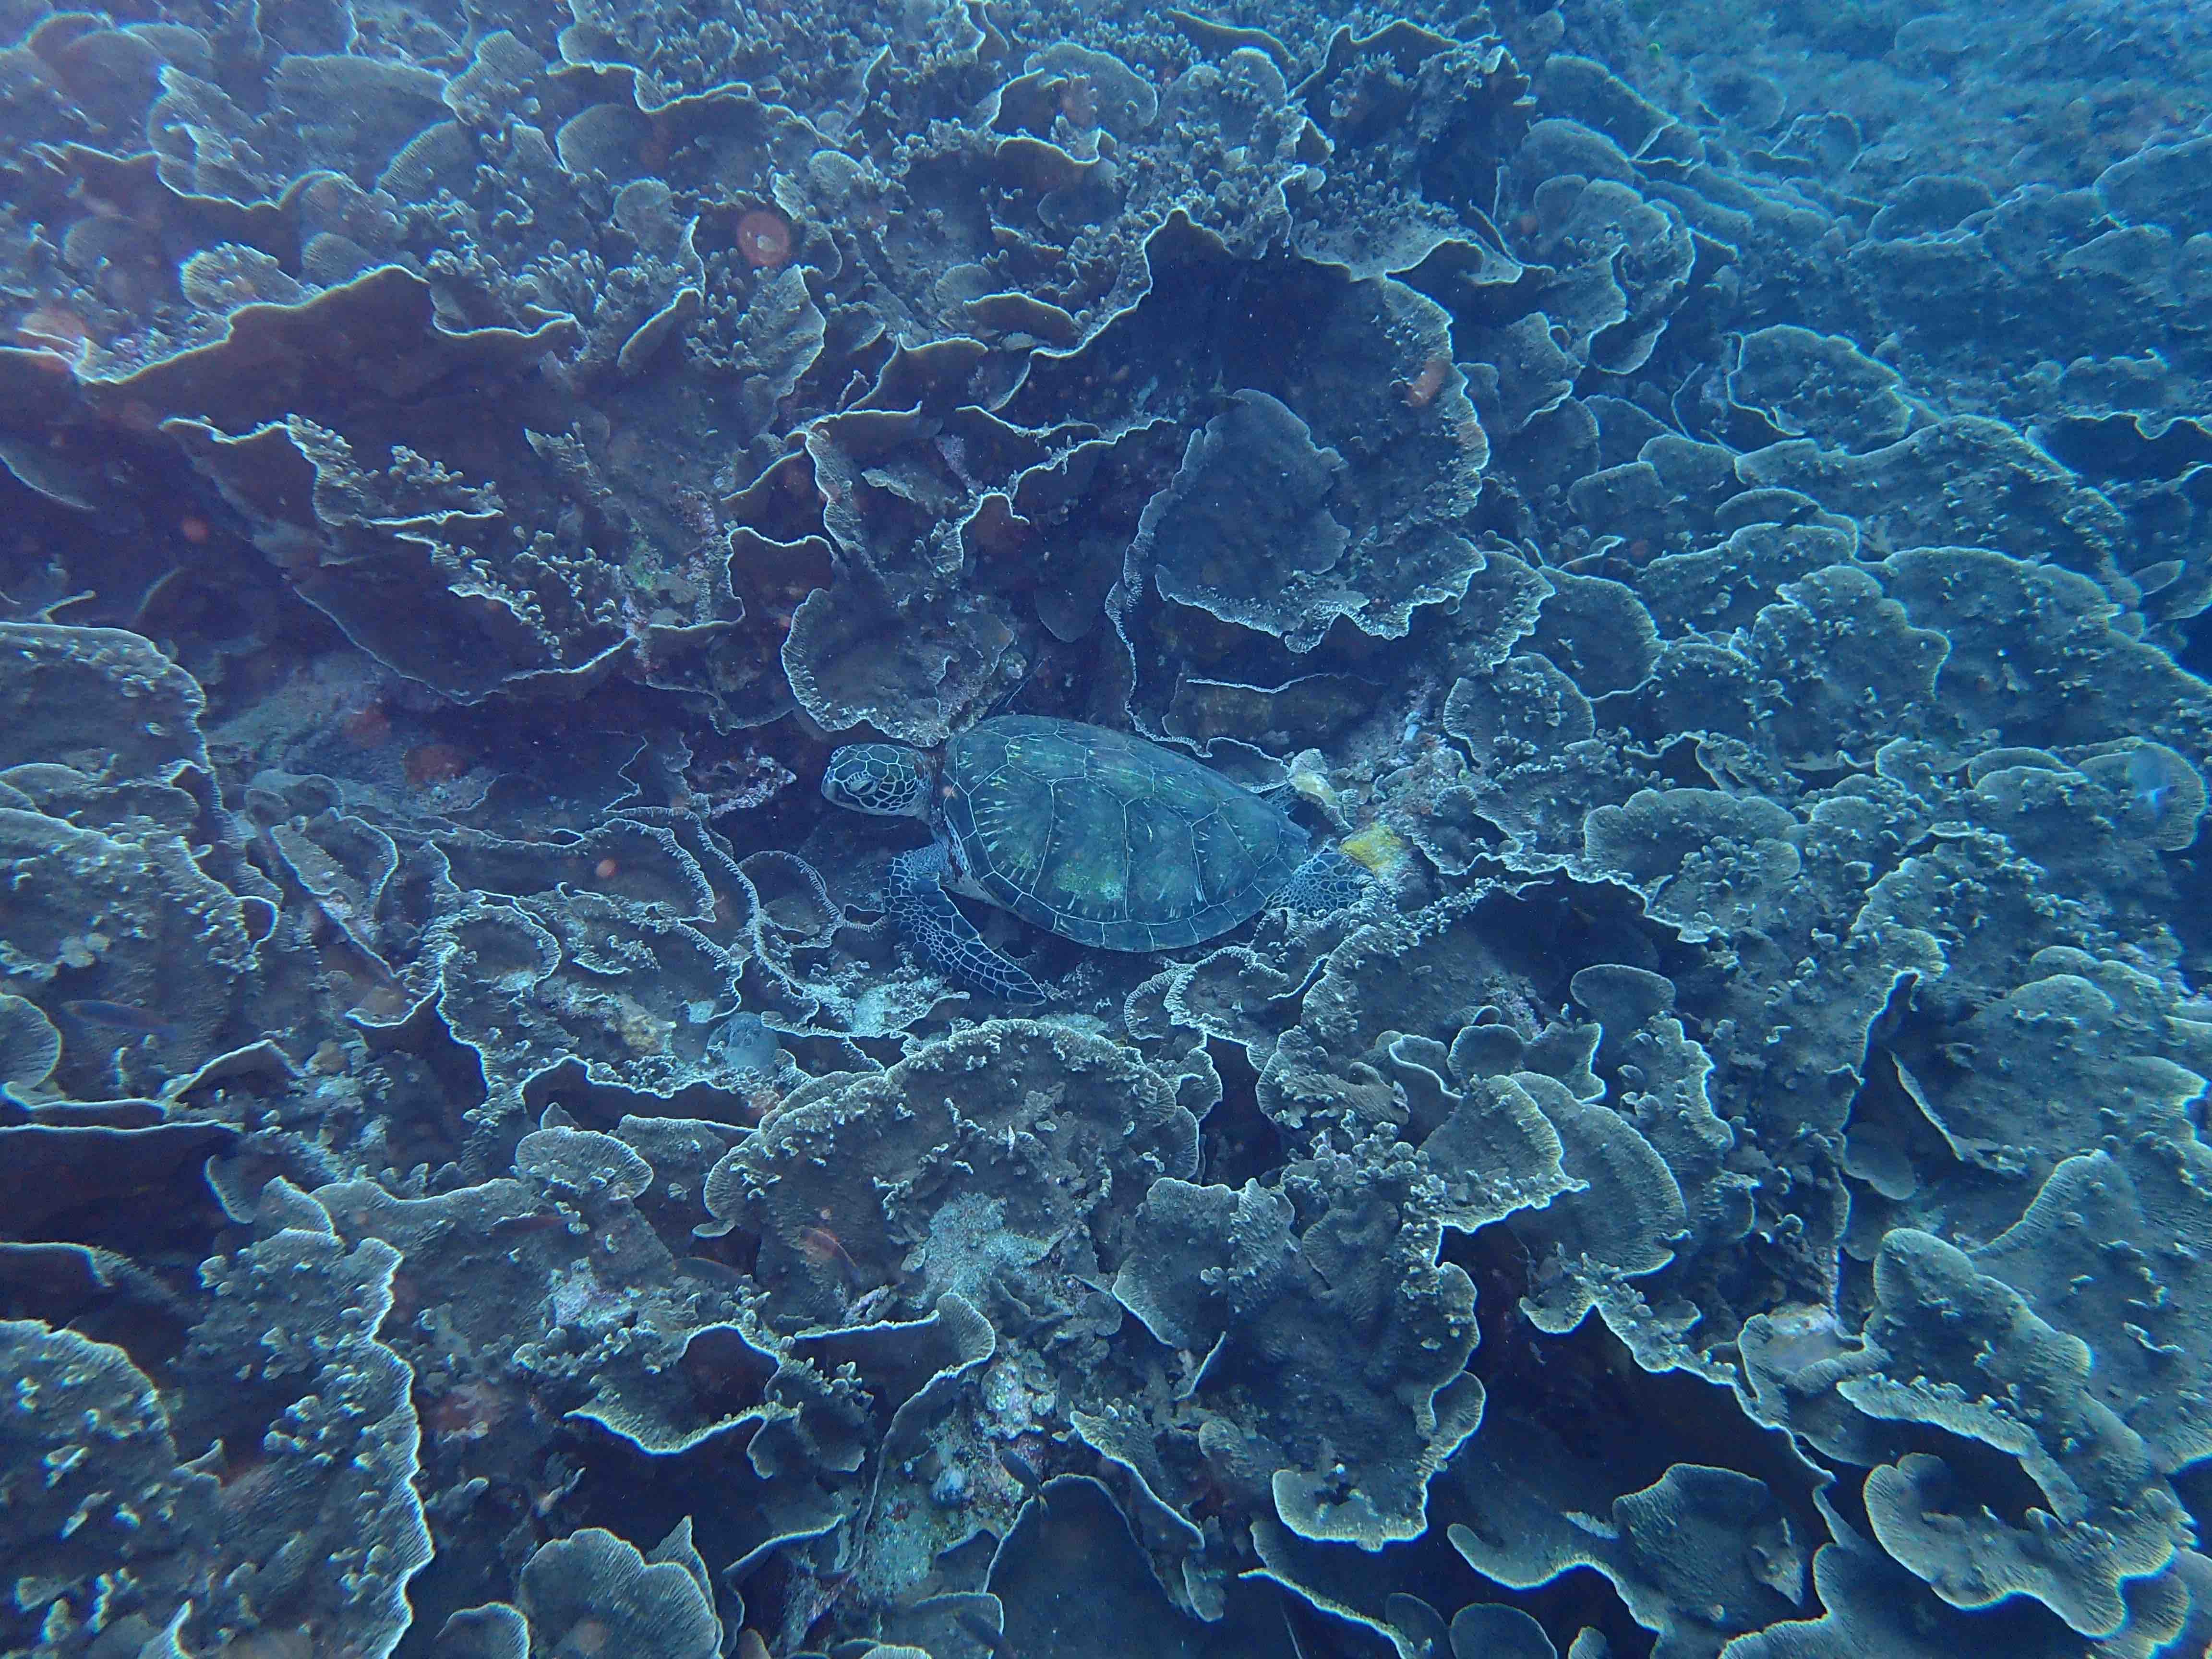 http://www.aquamarine-dive.net/blog/index.html/2015/05/22/P5060010.jpg